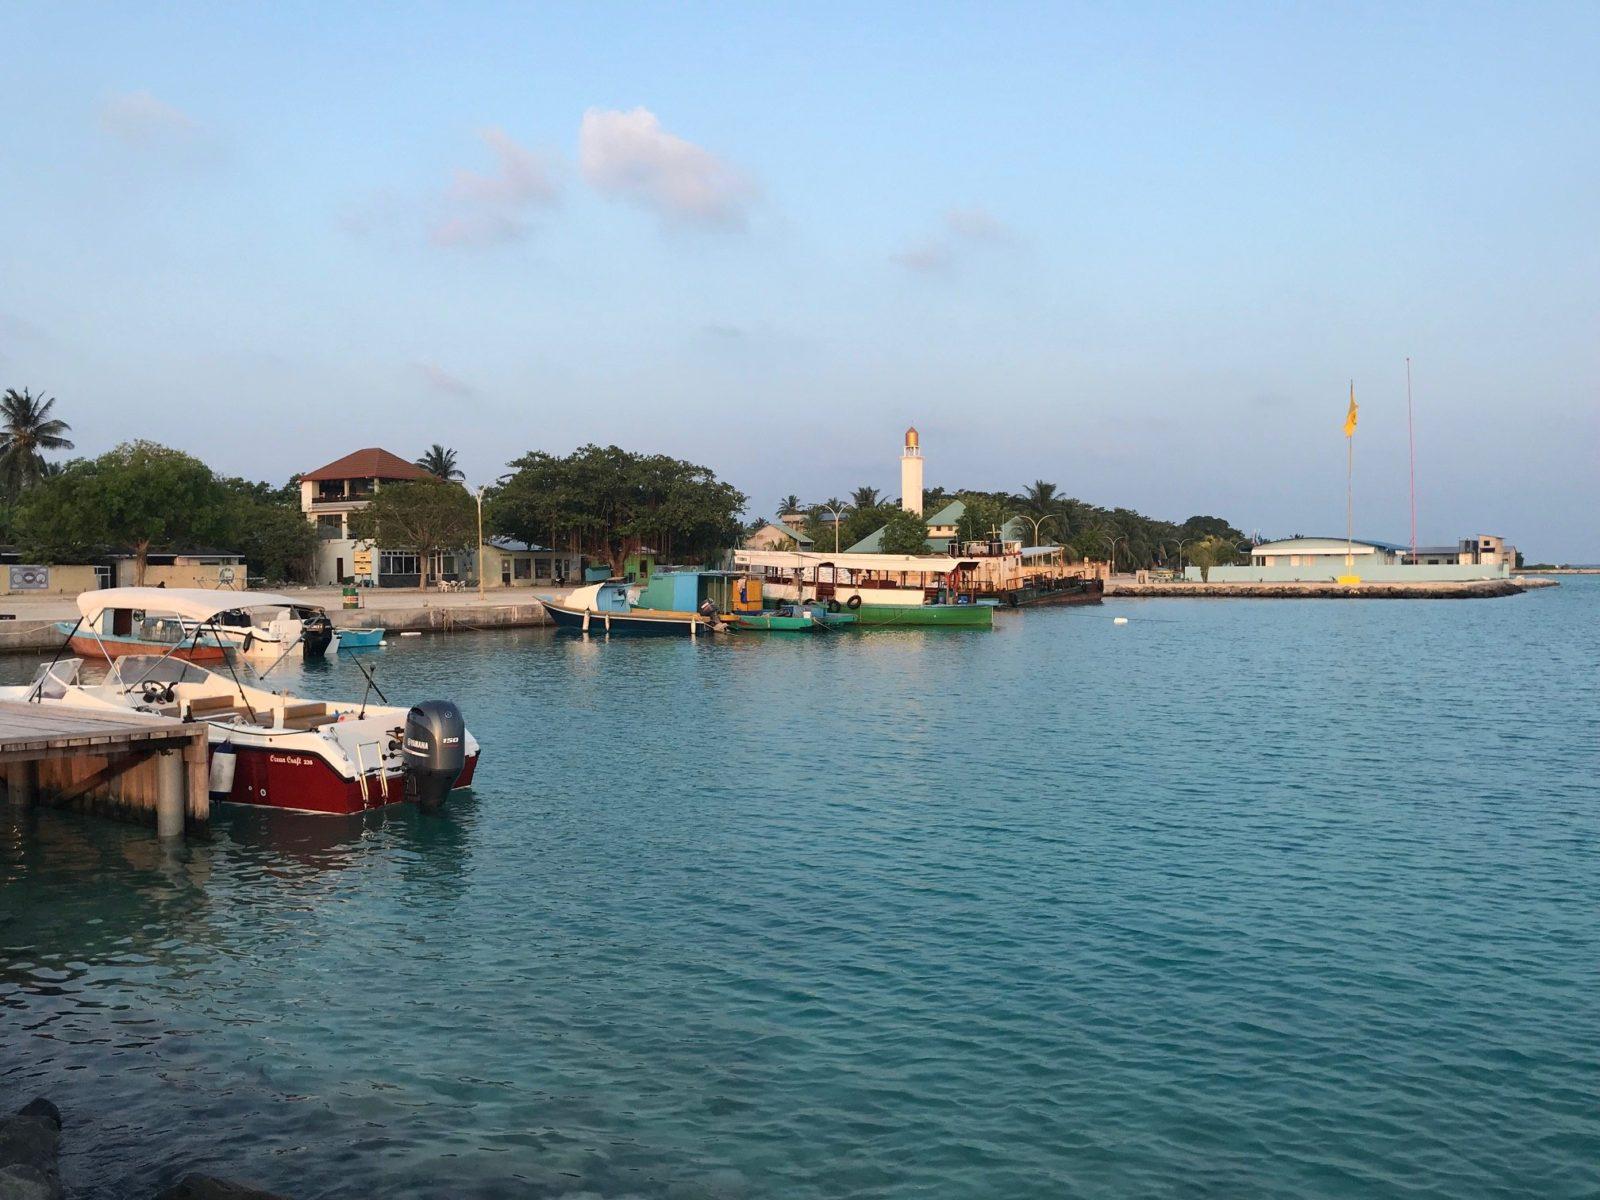 пристань на острове Укулхас на Мальдивах